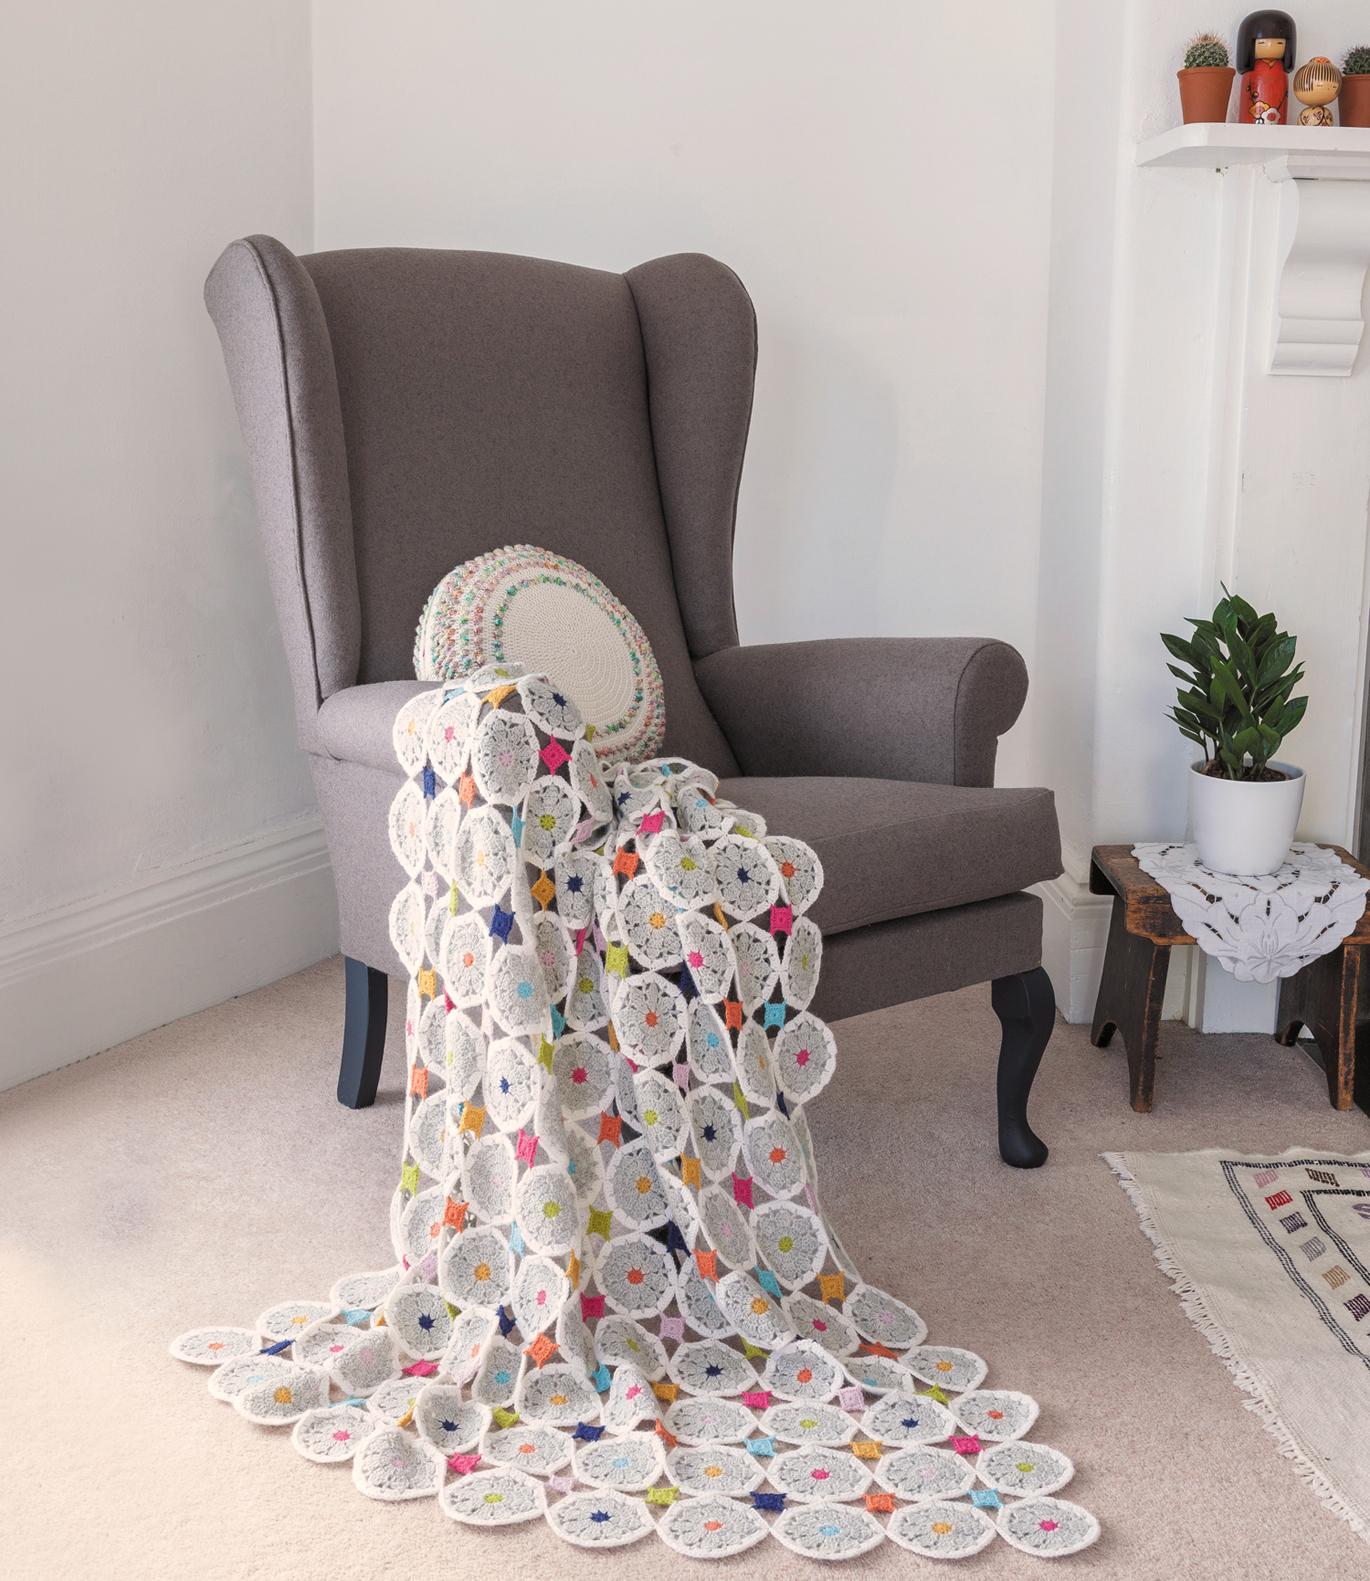 Daisy Dot Lap Blanket from Crochet Home by Emma Lamb.jpg